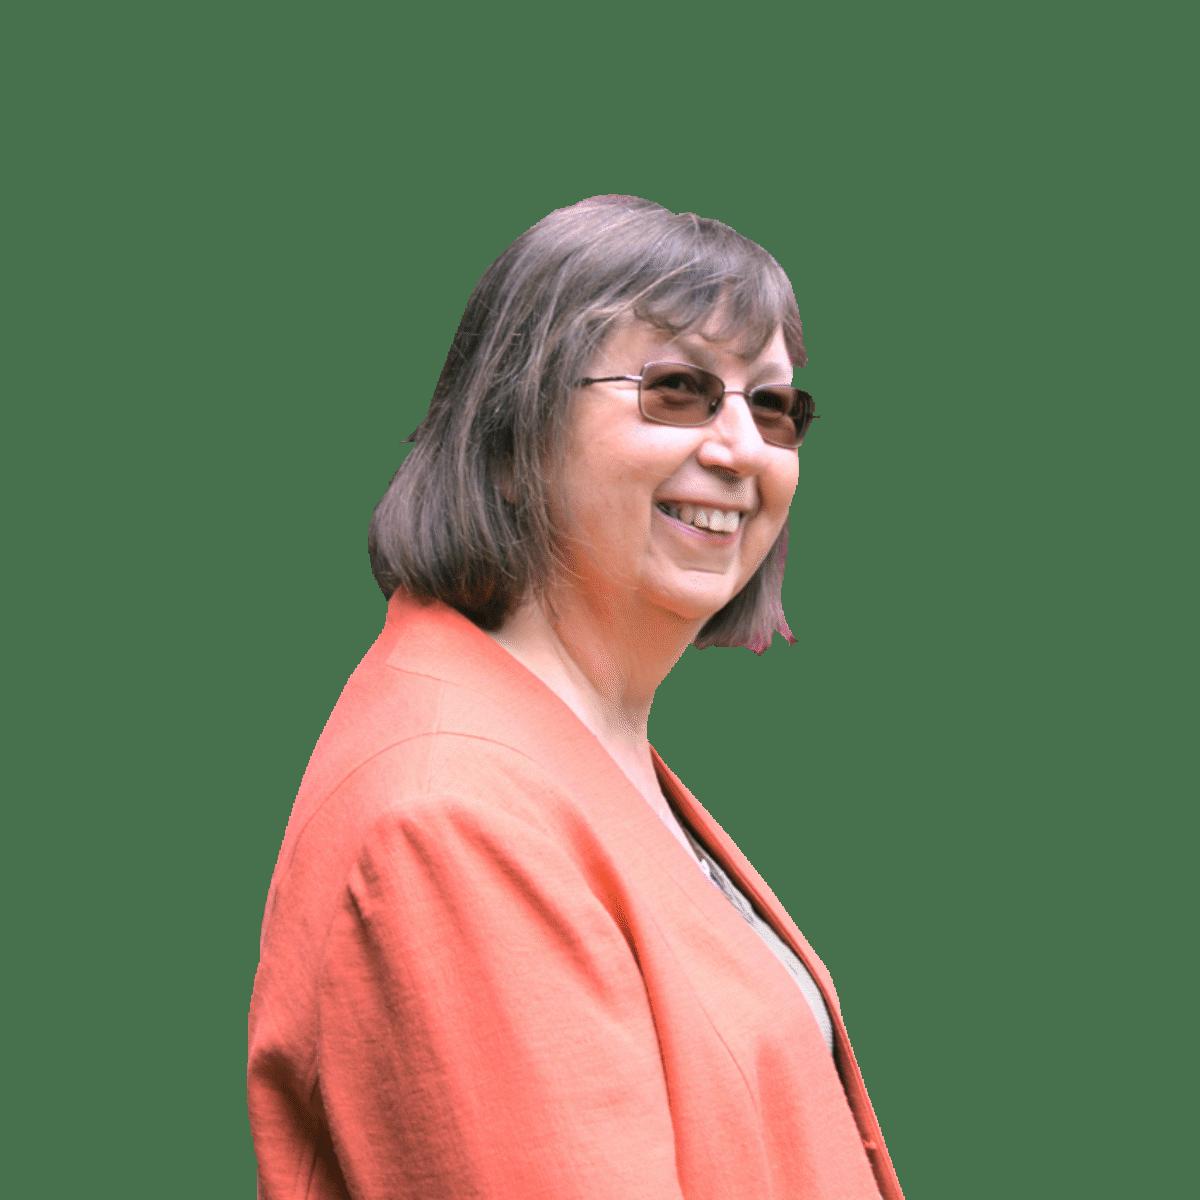 Judy Dean smiling